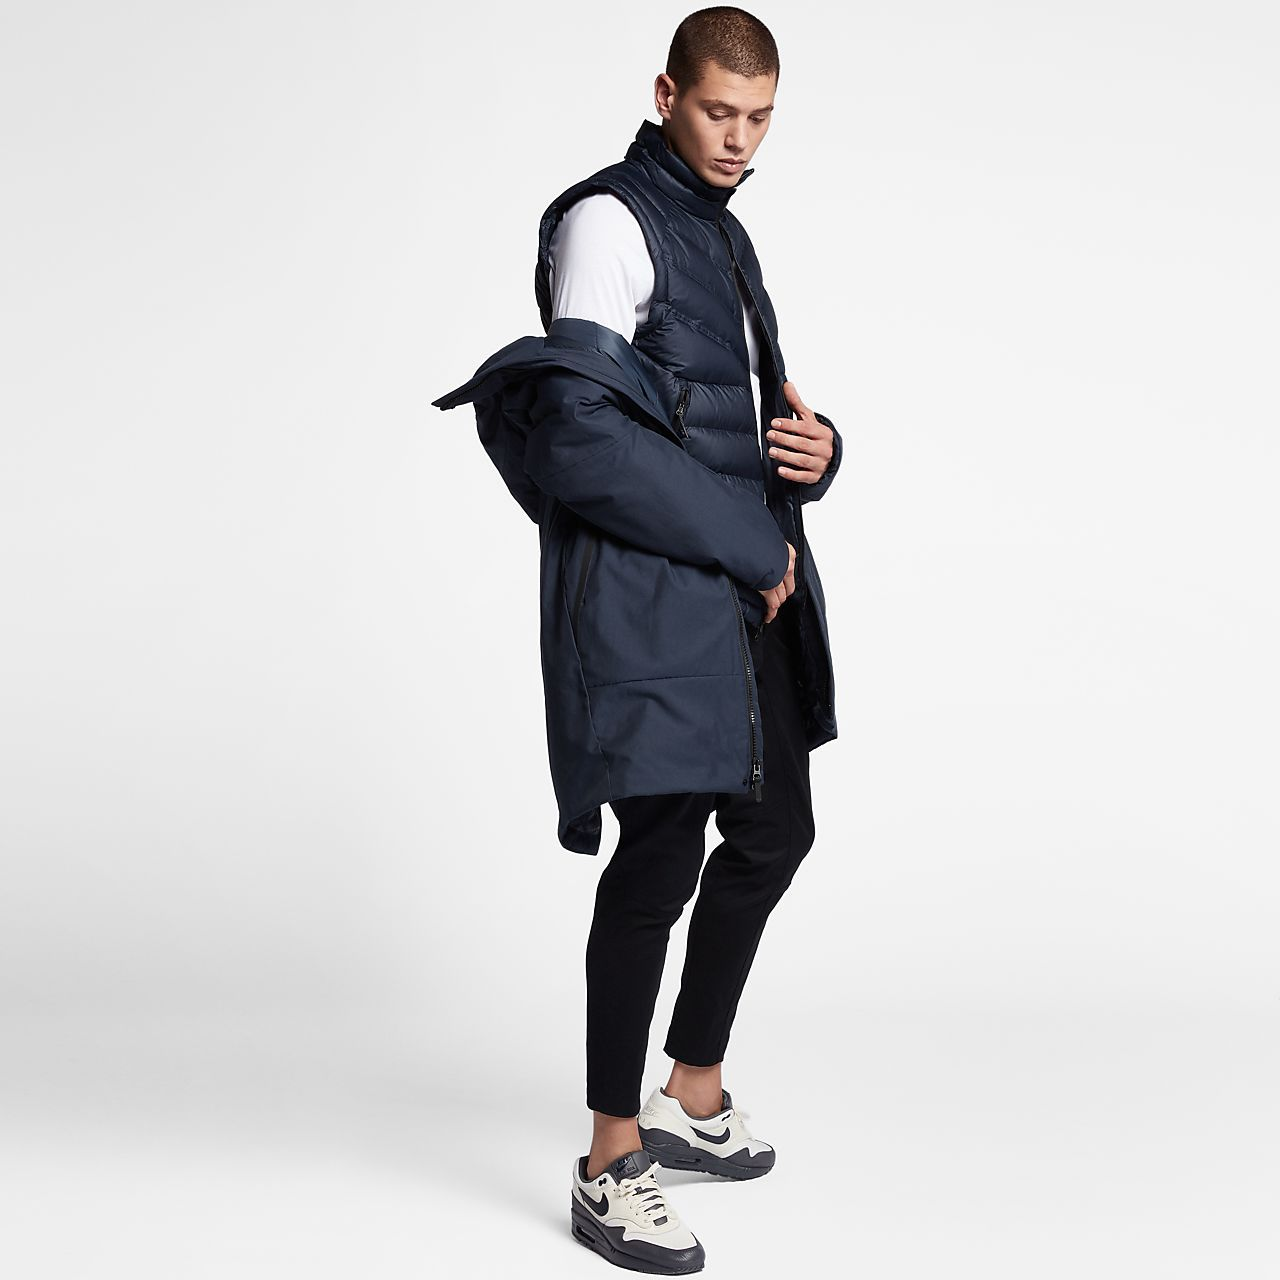 innovative design 7dcf1 853fa Kurtka męska Nike Sportswear Tech AeroLoft 3-in-1